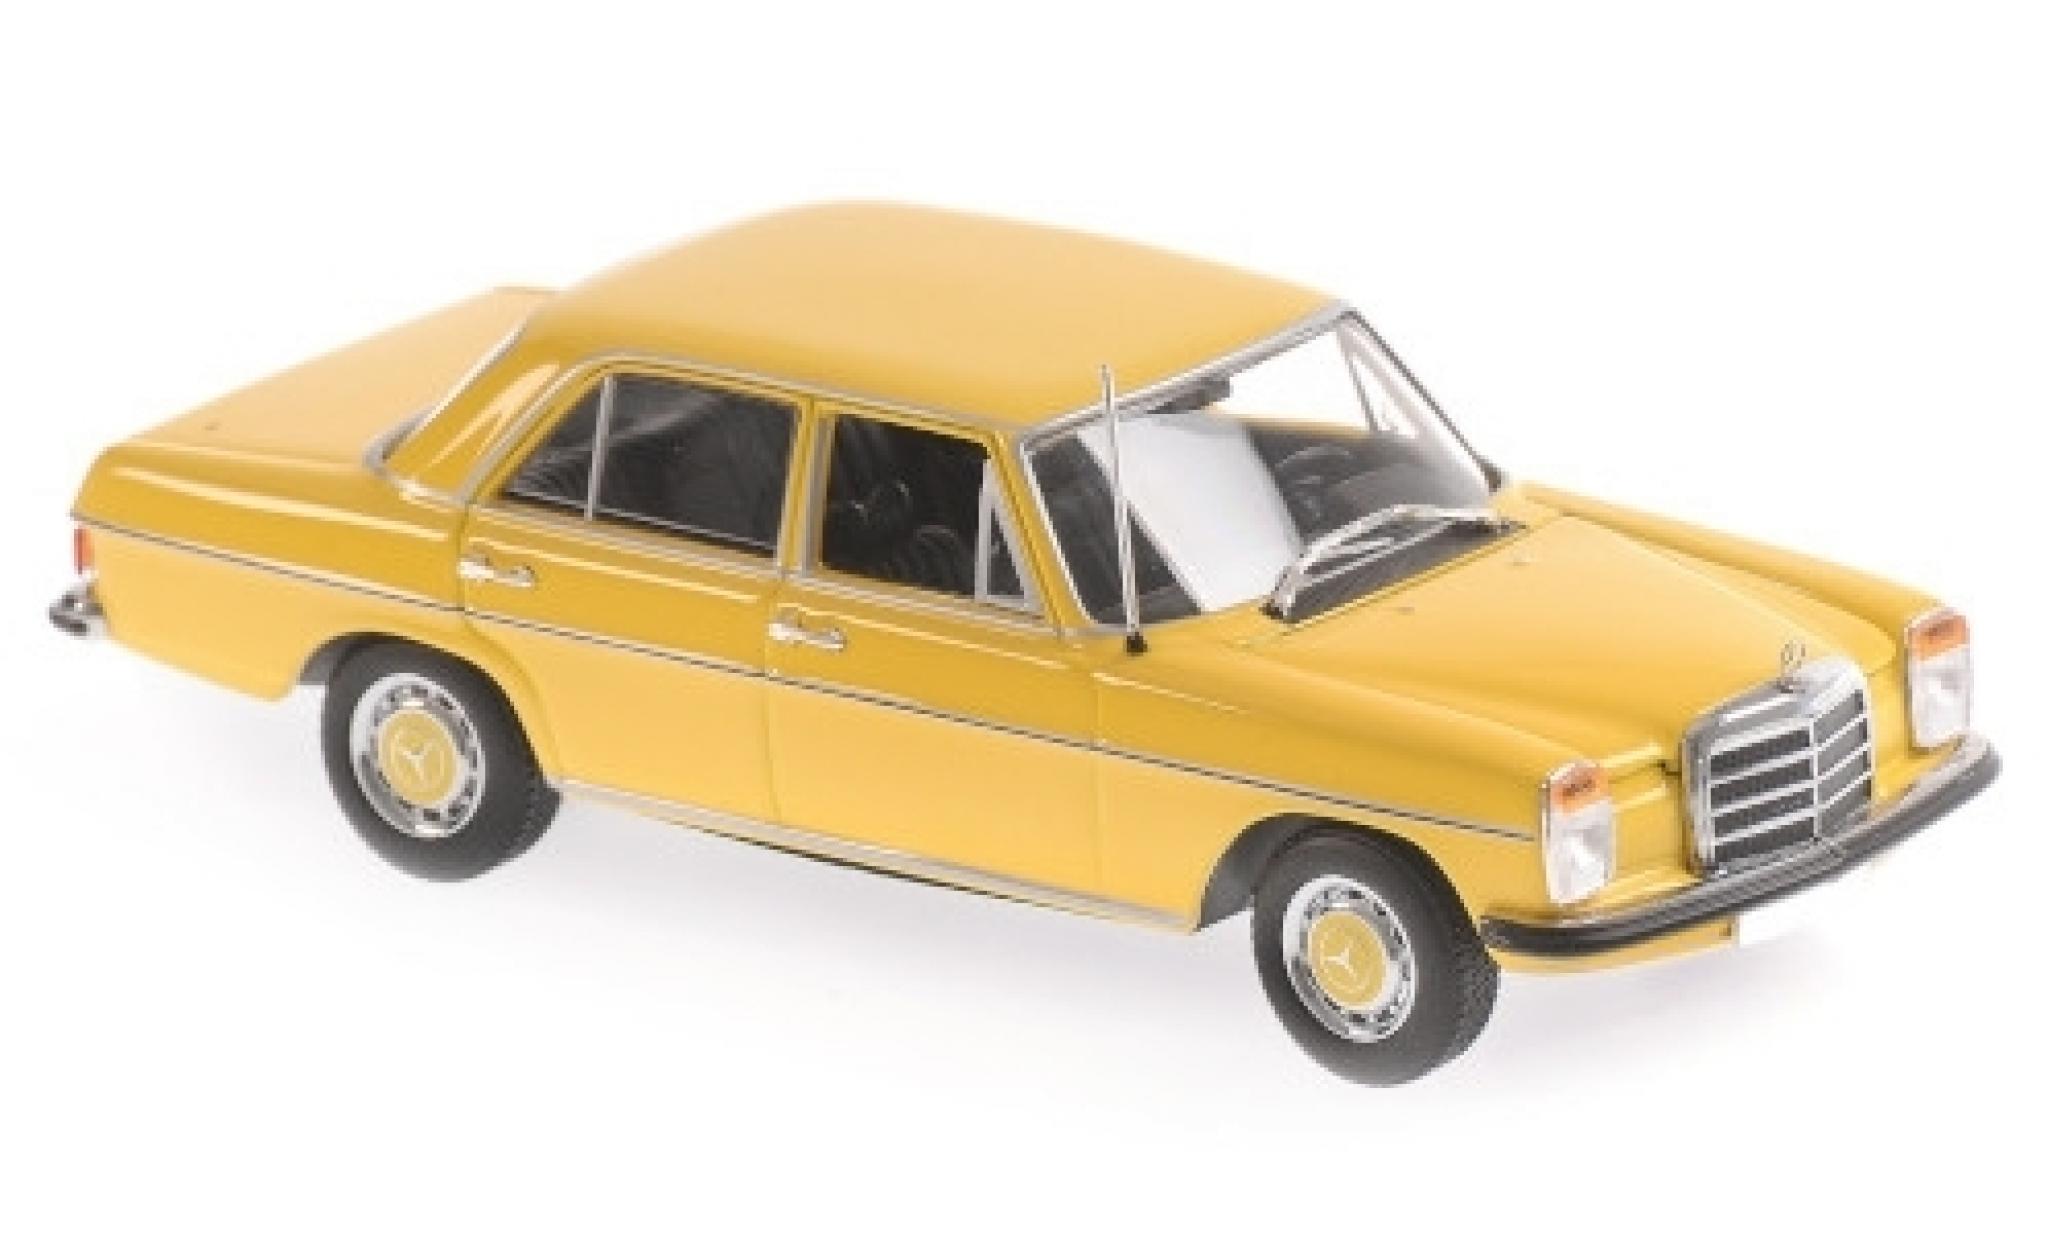 Mercedes 200 1/43 Maxichamps yellow 1968